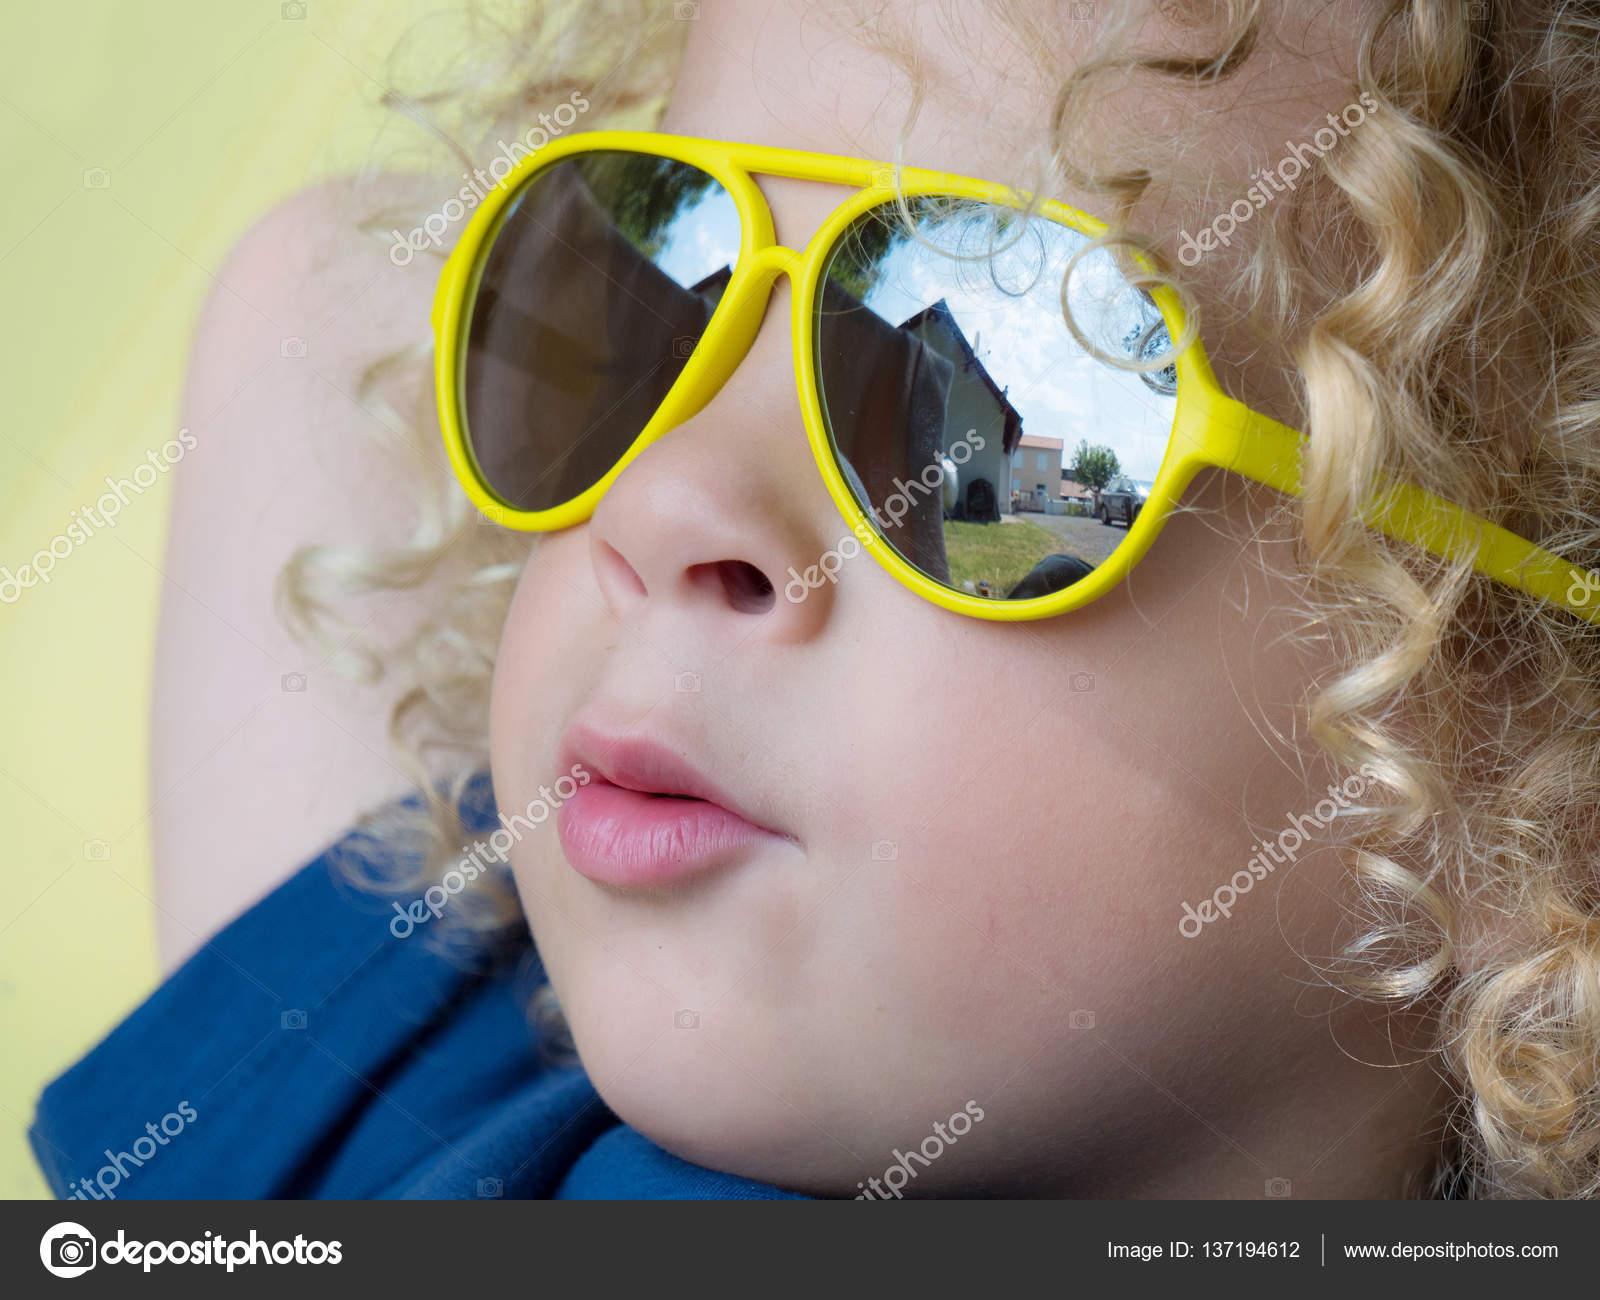 Amarillo Foto Stock Philipimage Niño — Gafas © Con De Rubio Sol rdBxoWQCe